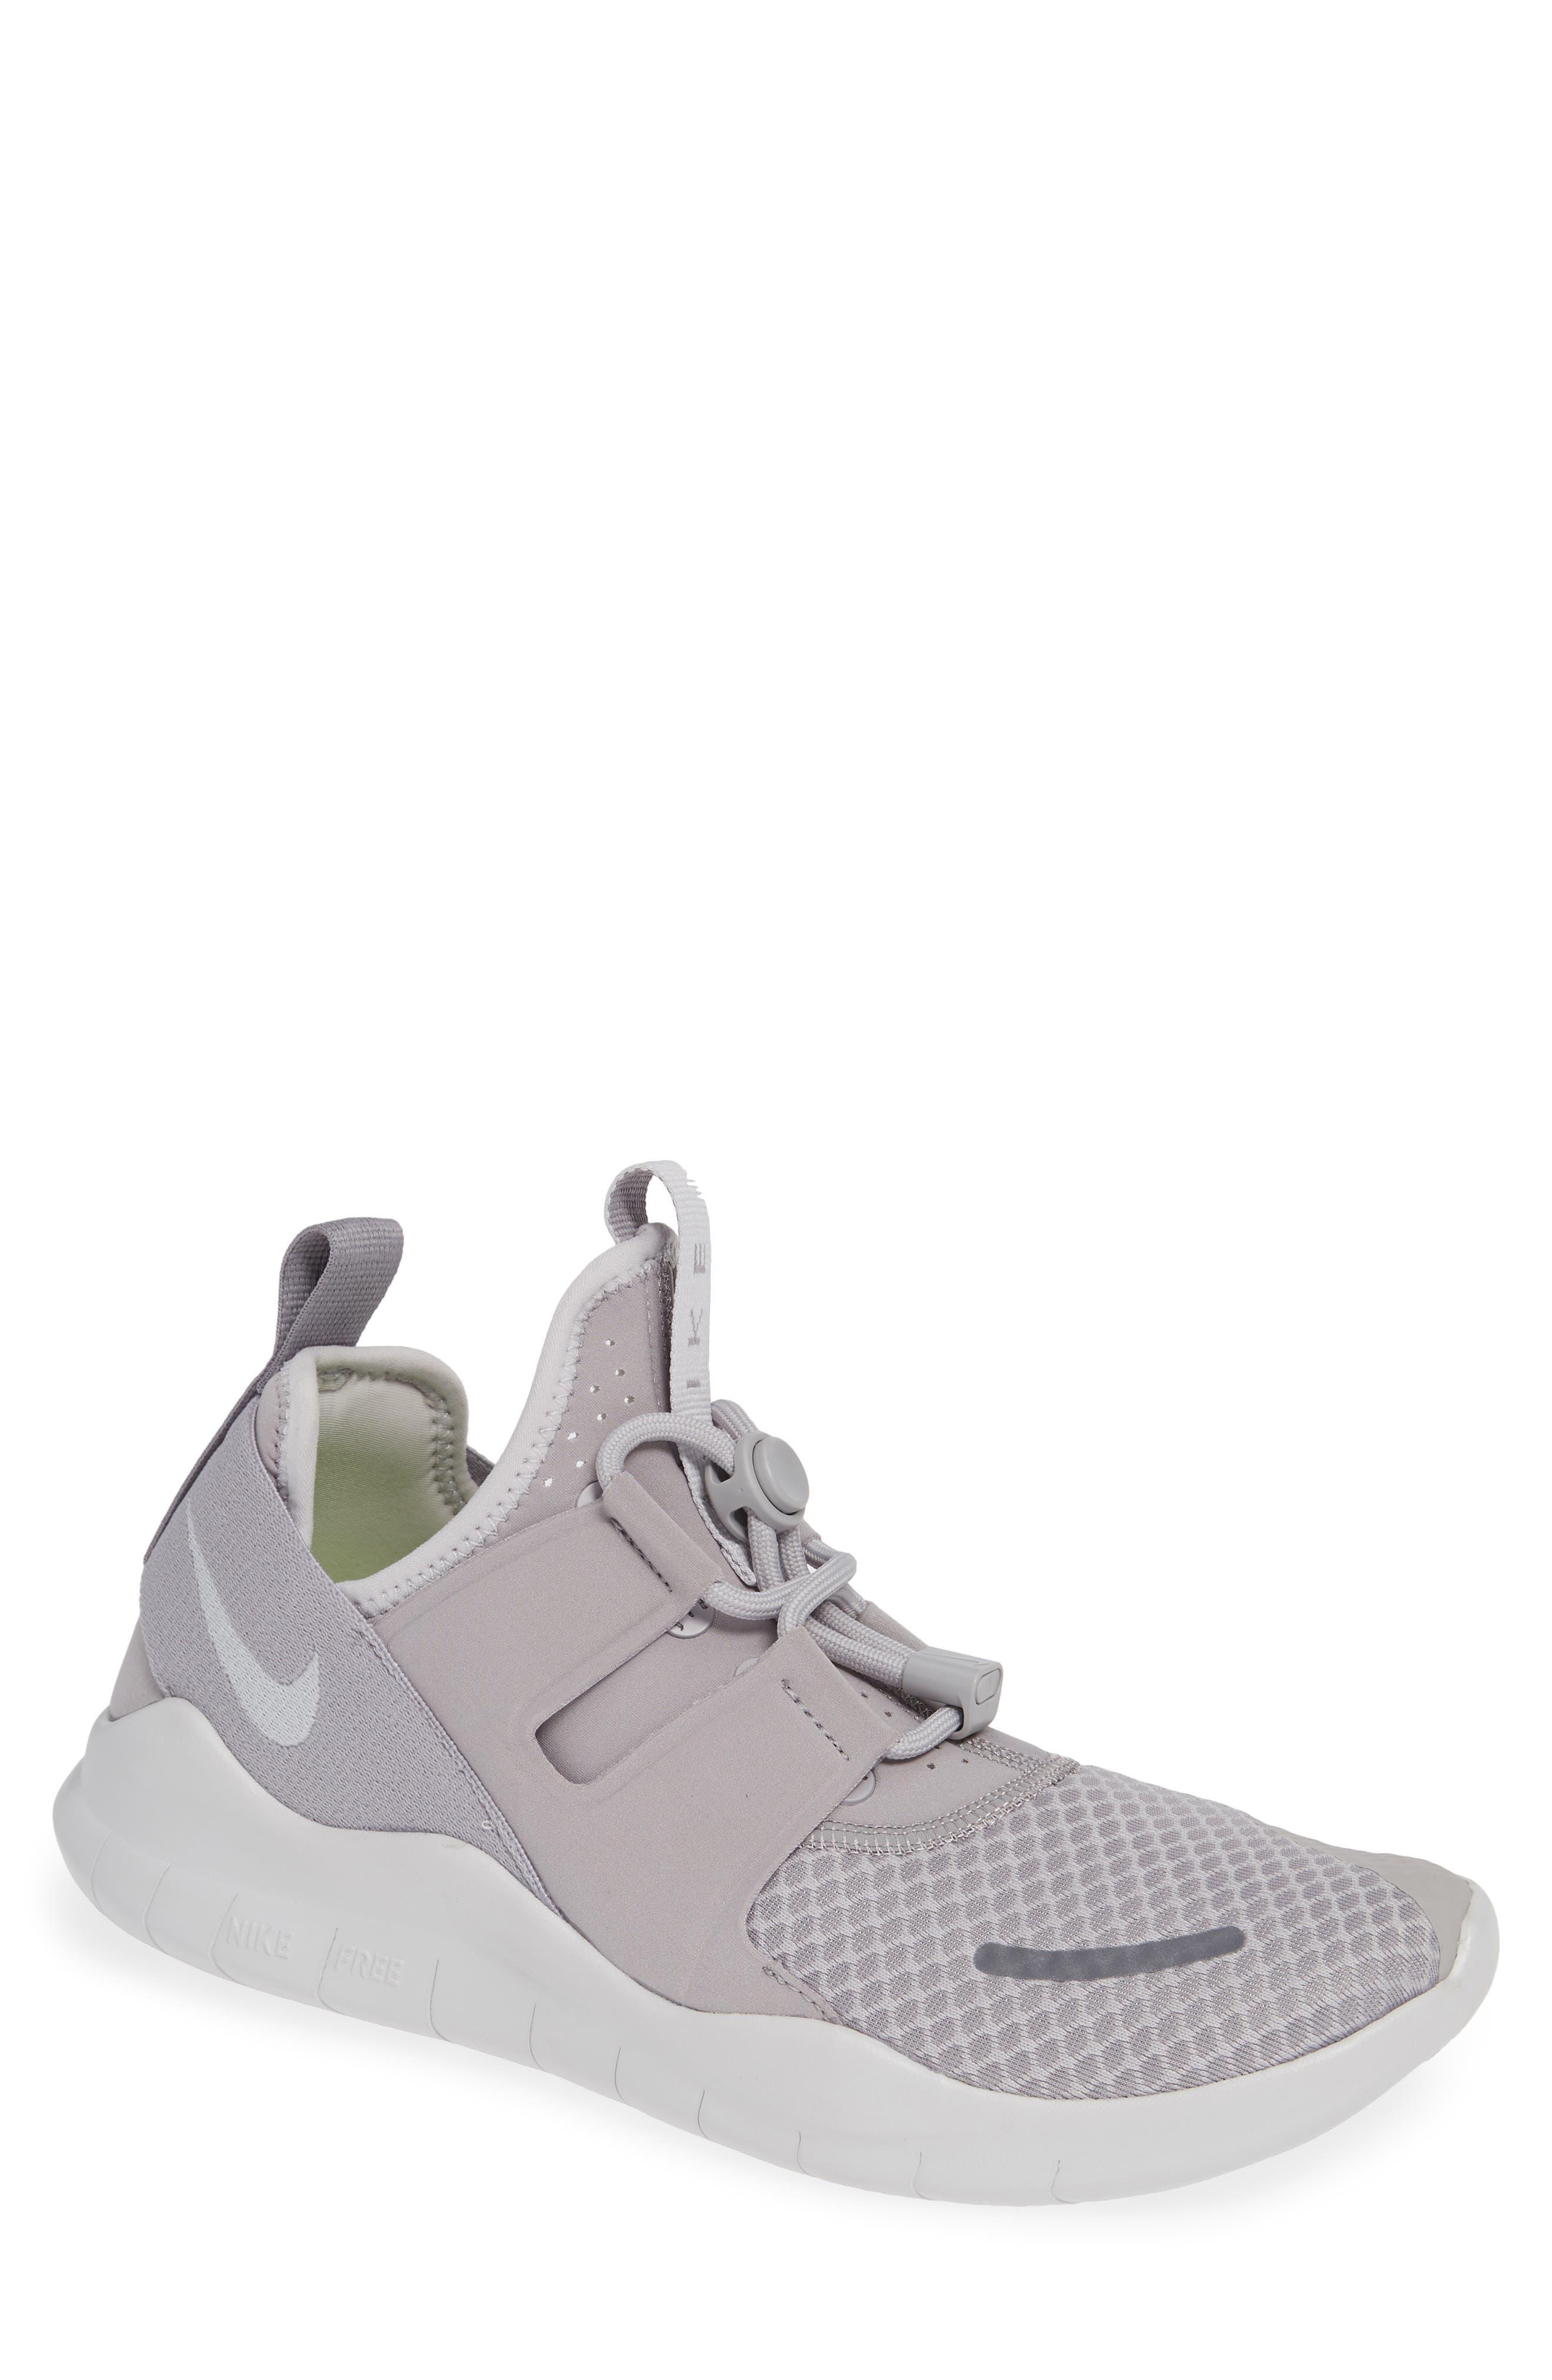 Free RN Commuter 2018 Running Shoe,                         Main,                         color, ATMOSPHERE GREY/ VAST GREY